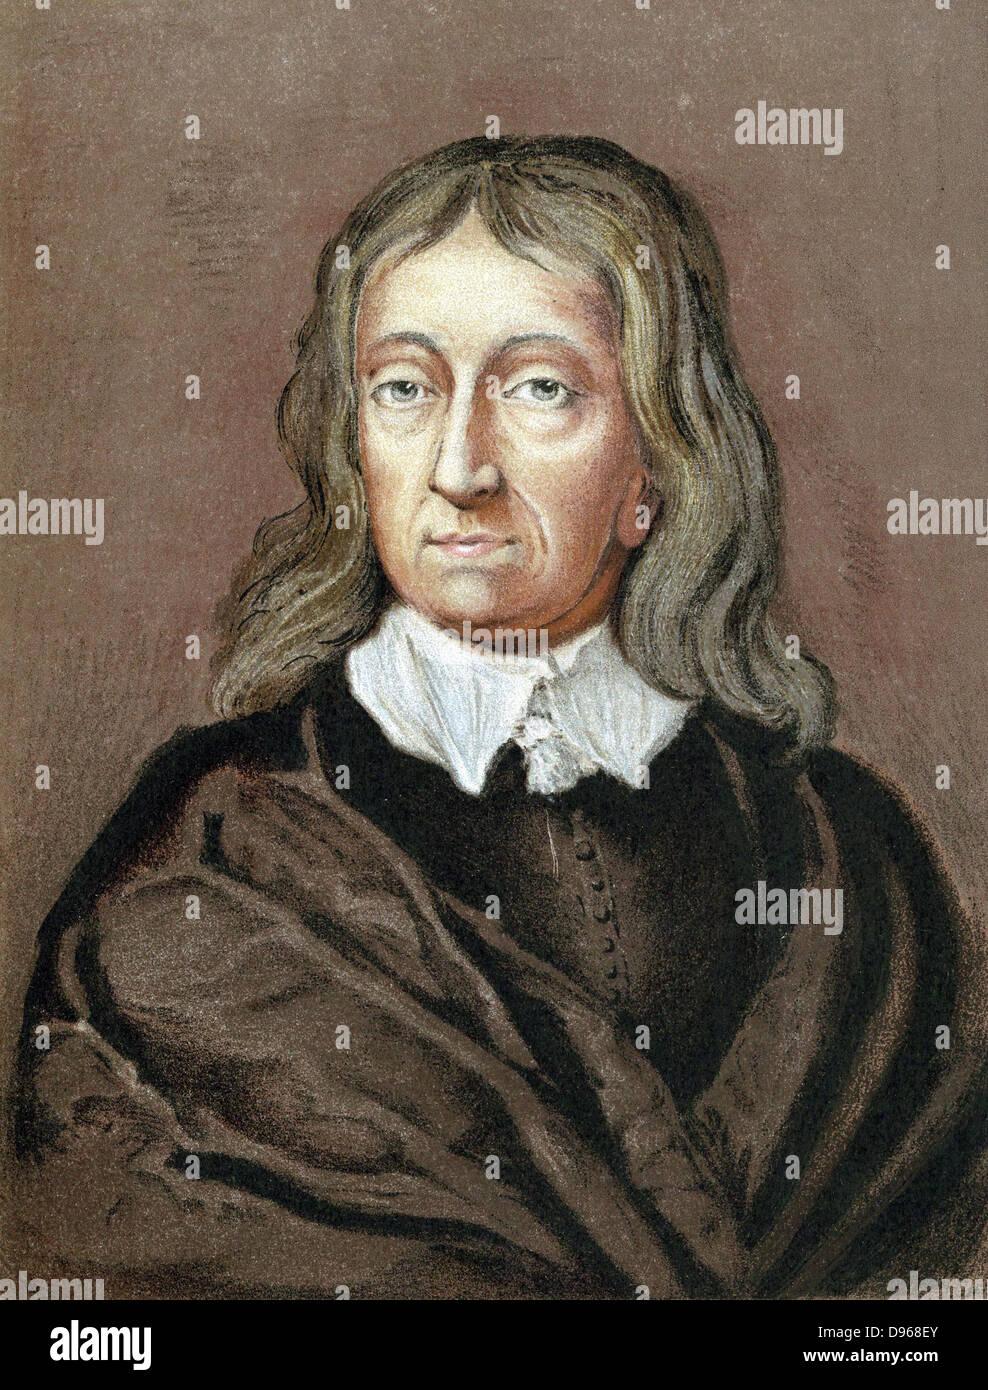 John Milton (1608-74) English poet. Chromolithograph after crayon portrait by William Fairthorne (1616-91) - Stock Image